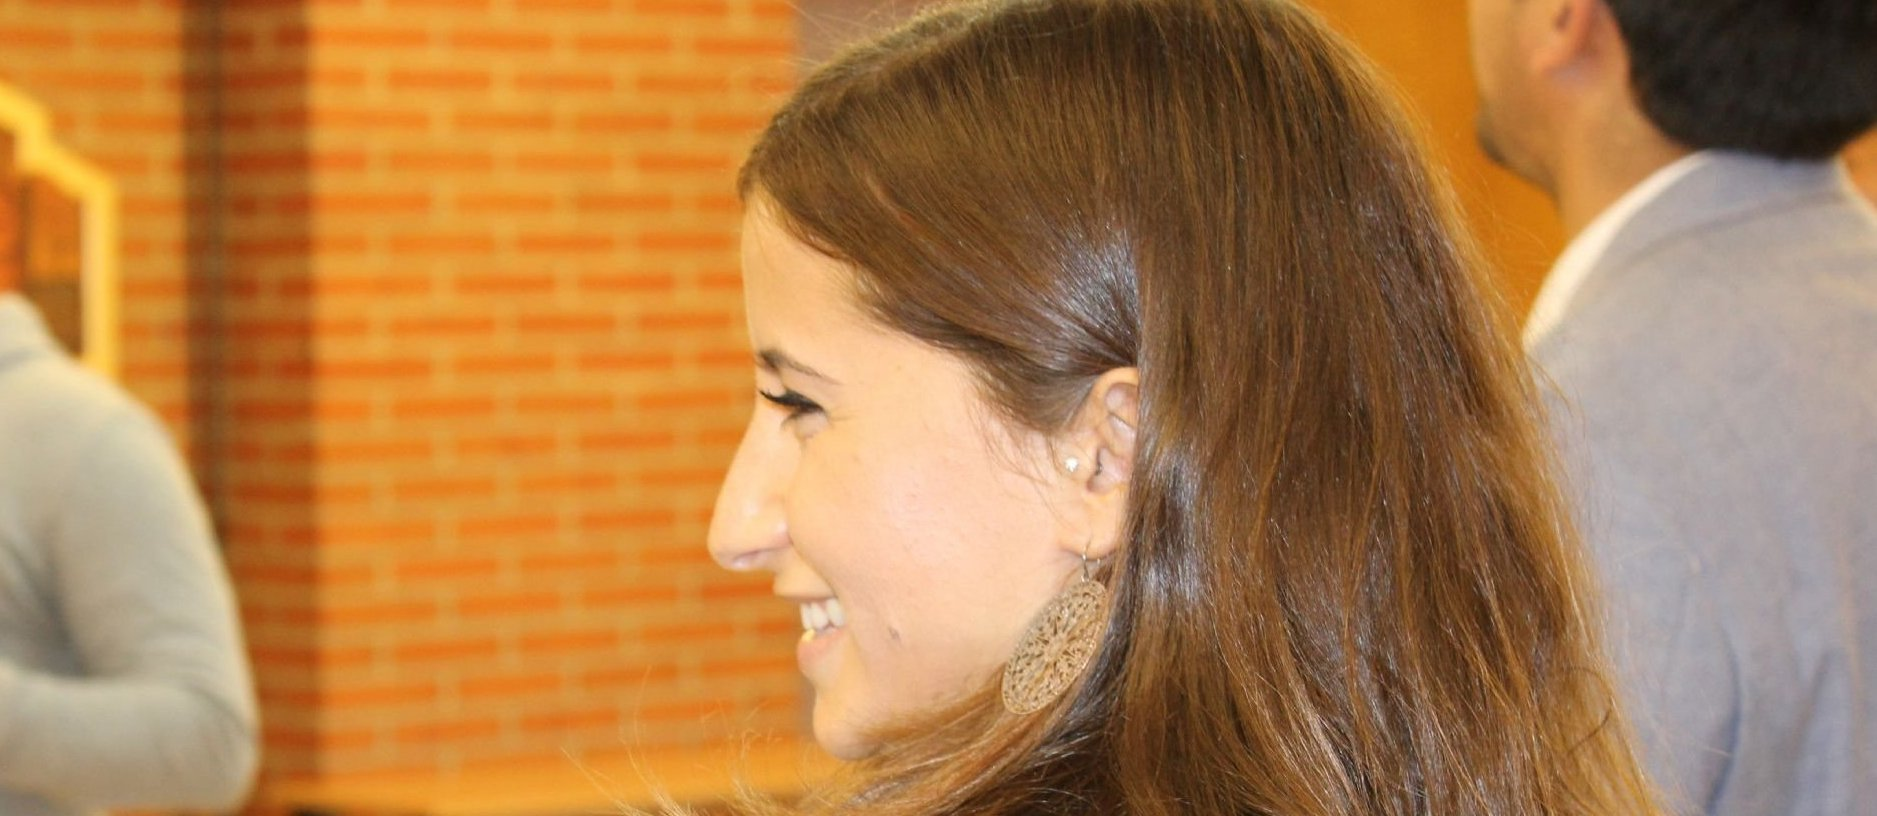 Elisabetta, coordinadora didáctica en la Acción Social de ONG CESAL